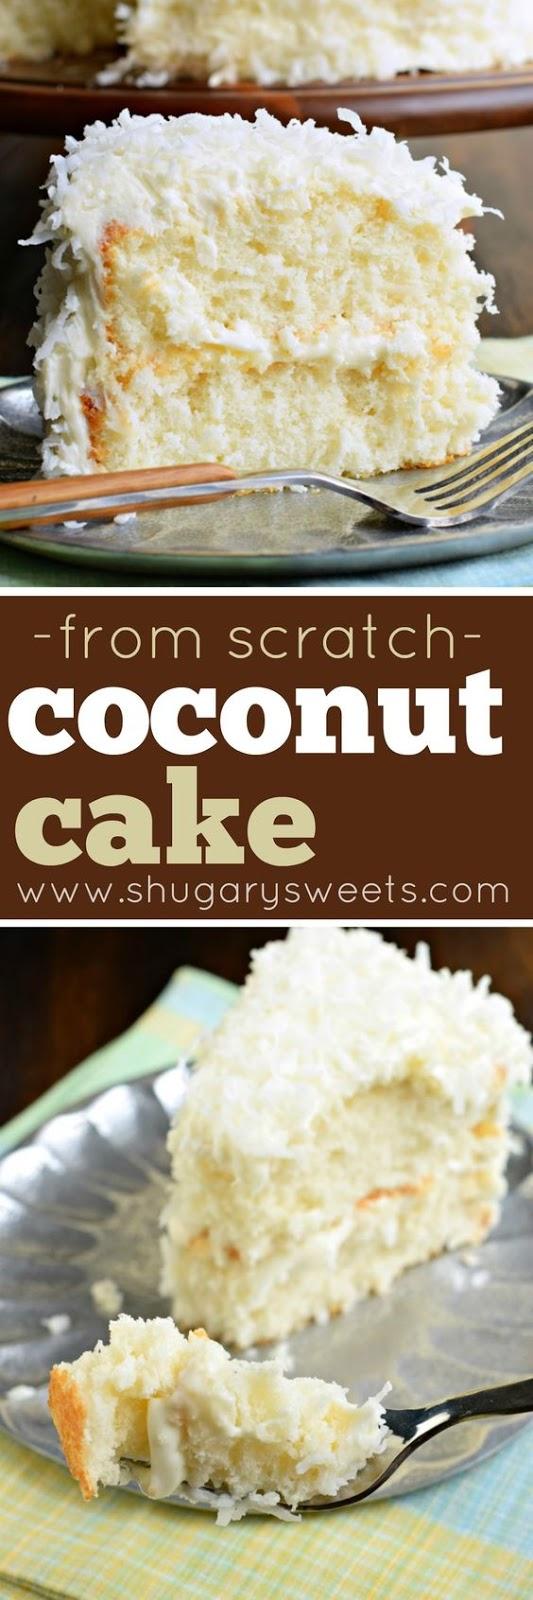 https://www.shugarysweets.com/coconut-cake/